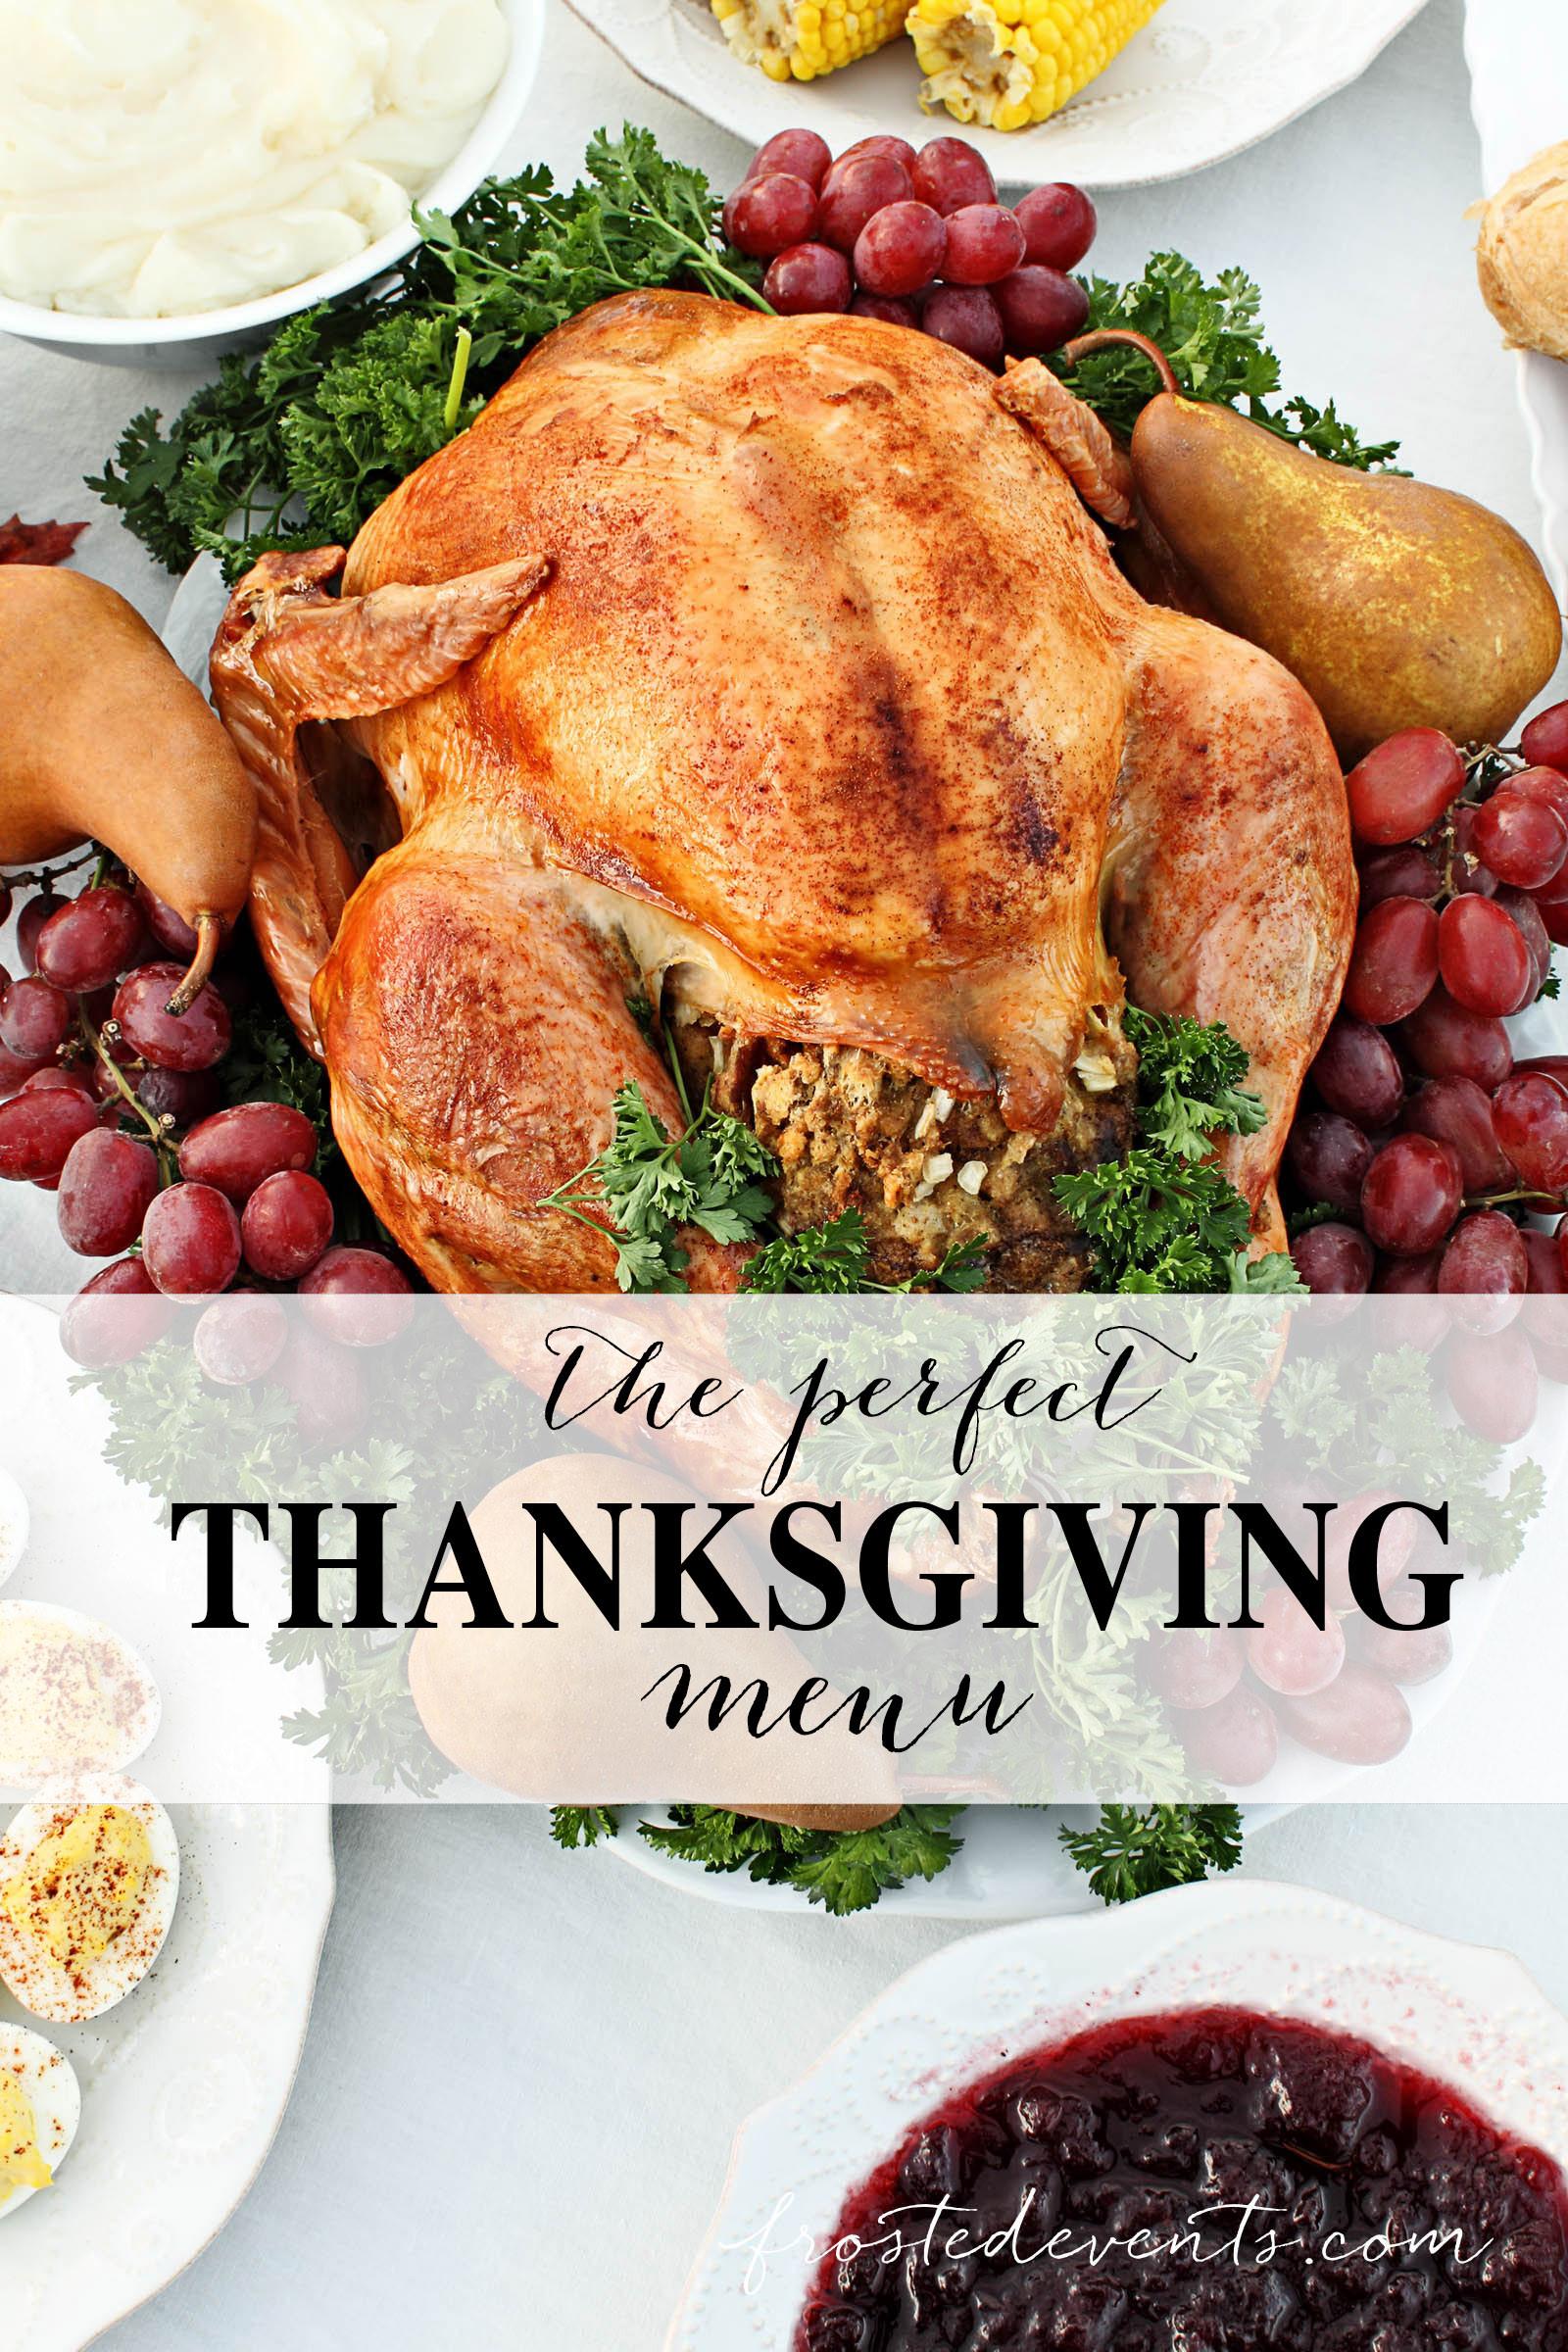 Thanksgiving Dinner Menu Ideas  Thanksgiving Dinner Menu Ideas What to Serve